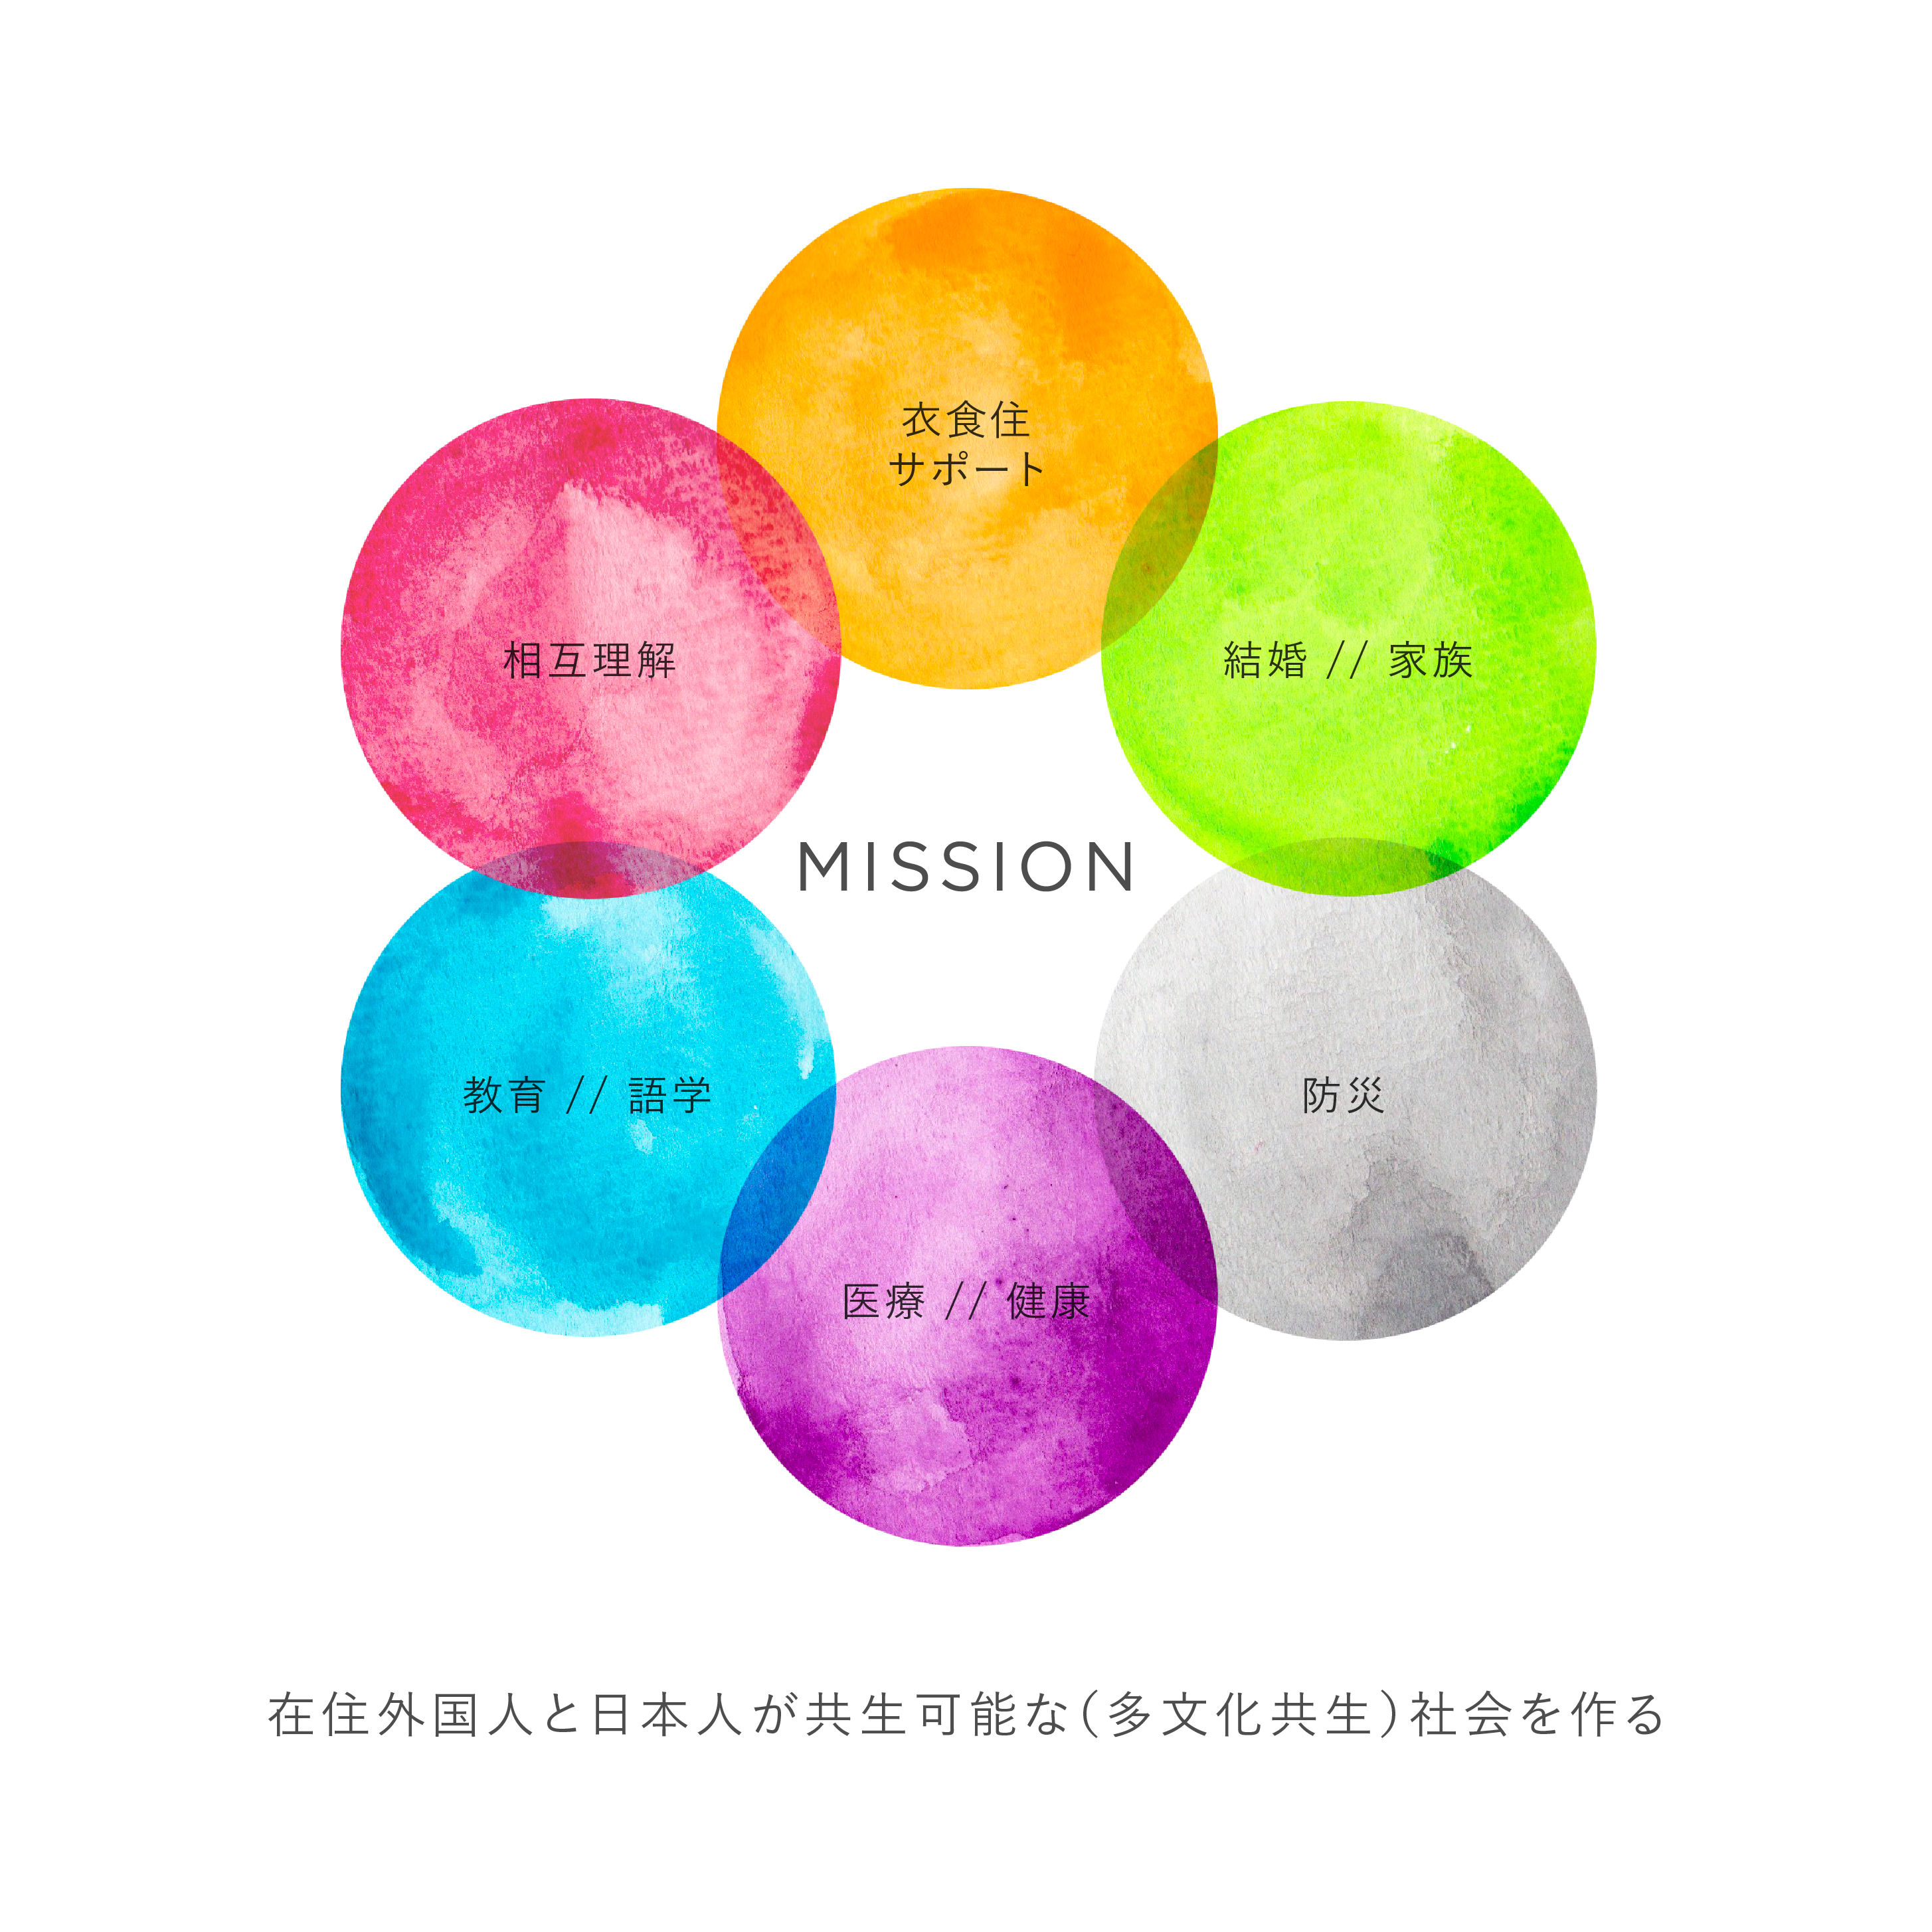 Mission Wheel